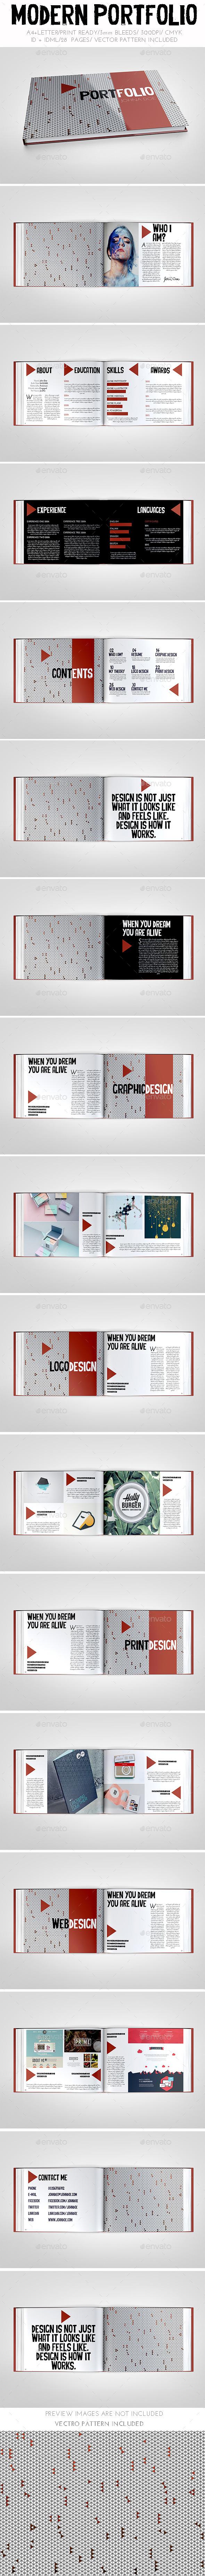 GraphicRiver Modern Portfolio Brochure 11290170